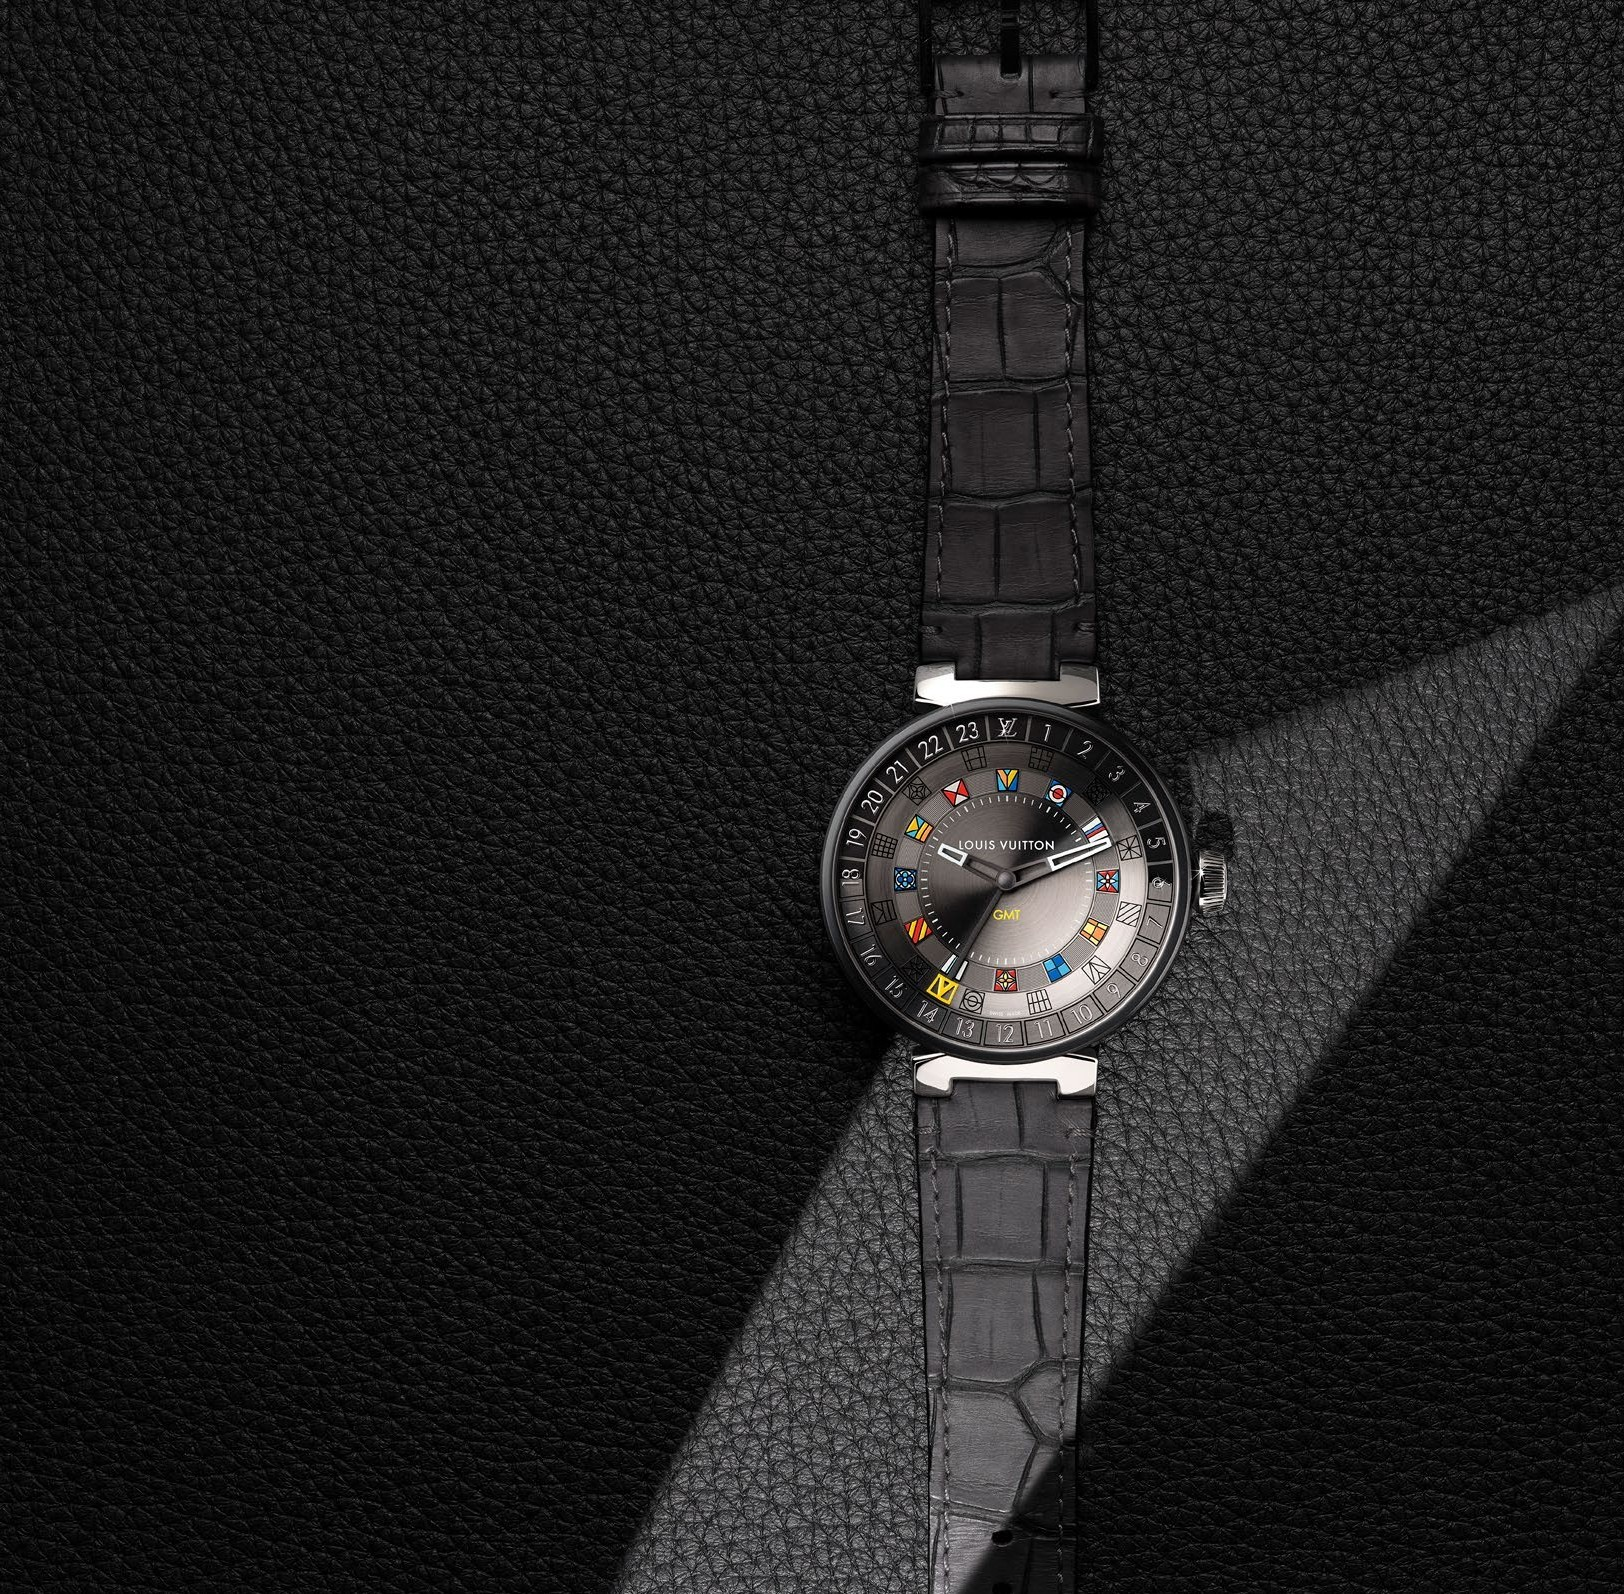 đồng hồ louis vuitton tambour moon dual time nam